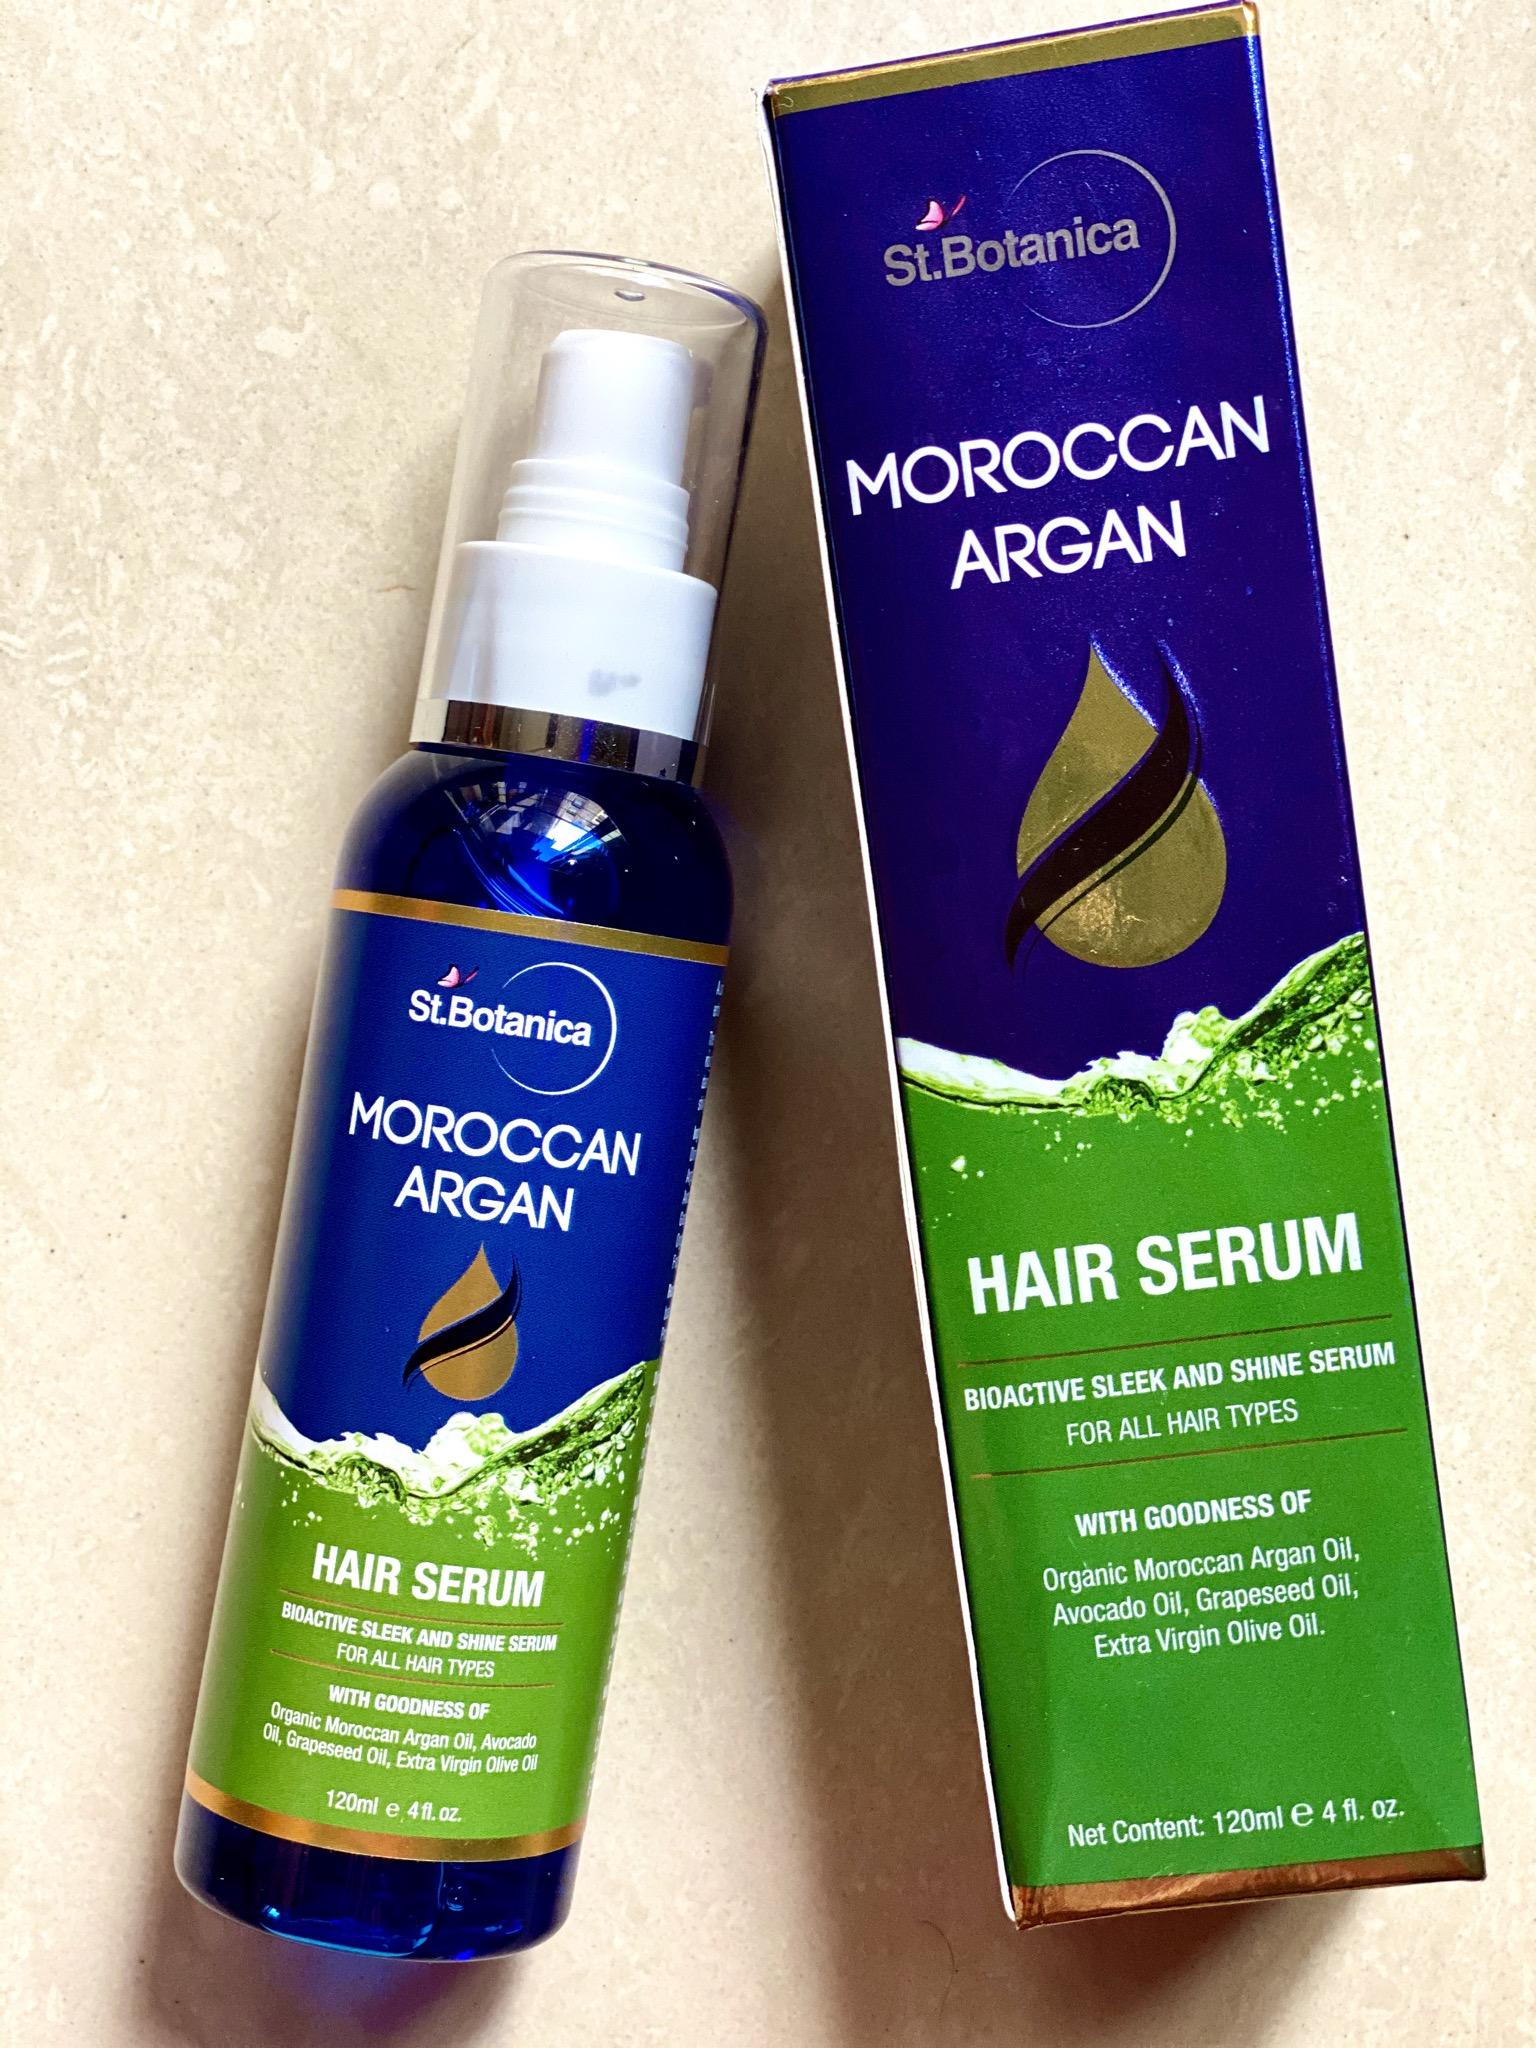 St.Botanica Moroccan Argan Hair Serum -Perfect serum for hair-By yogita_parmar